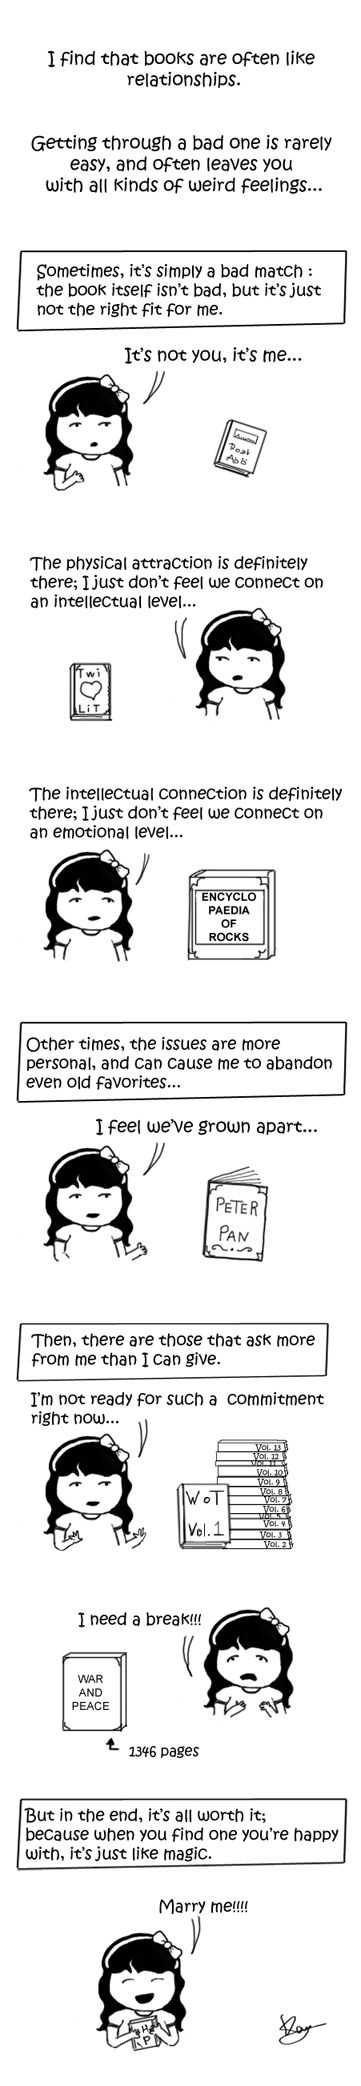 Comic by Kay of The Infinite Curio: http://www.infinitecurio.com/blog/2011/07/13/comic-relationships/